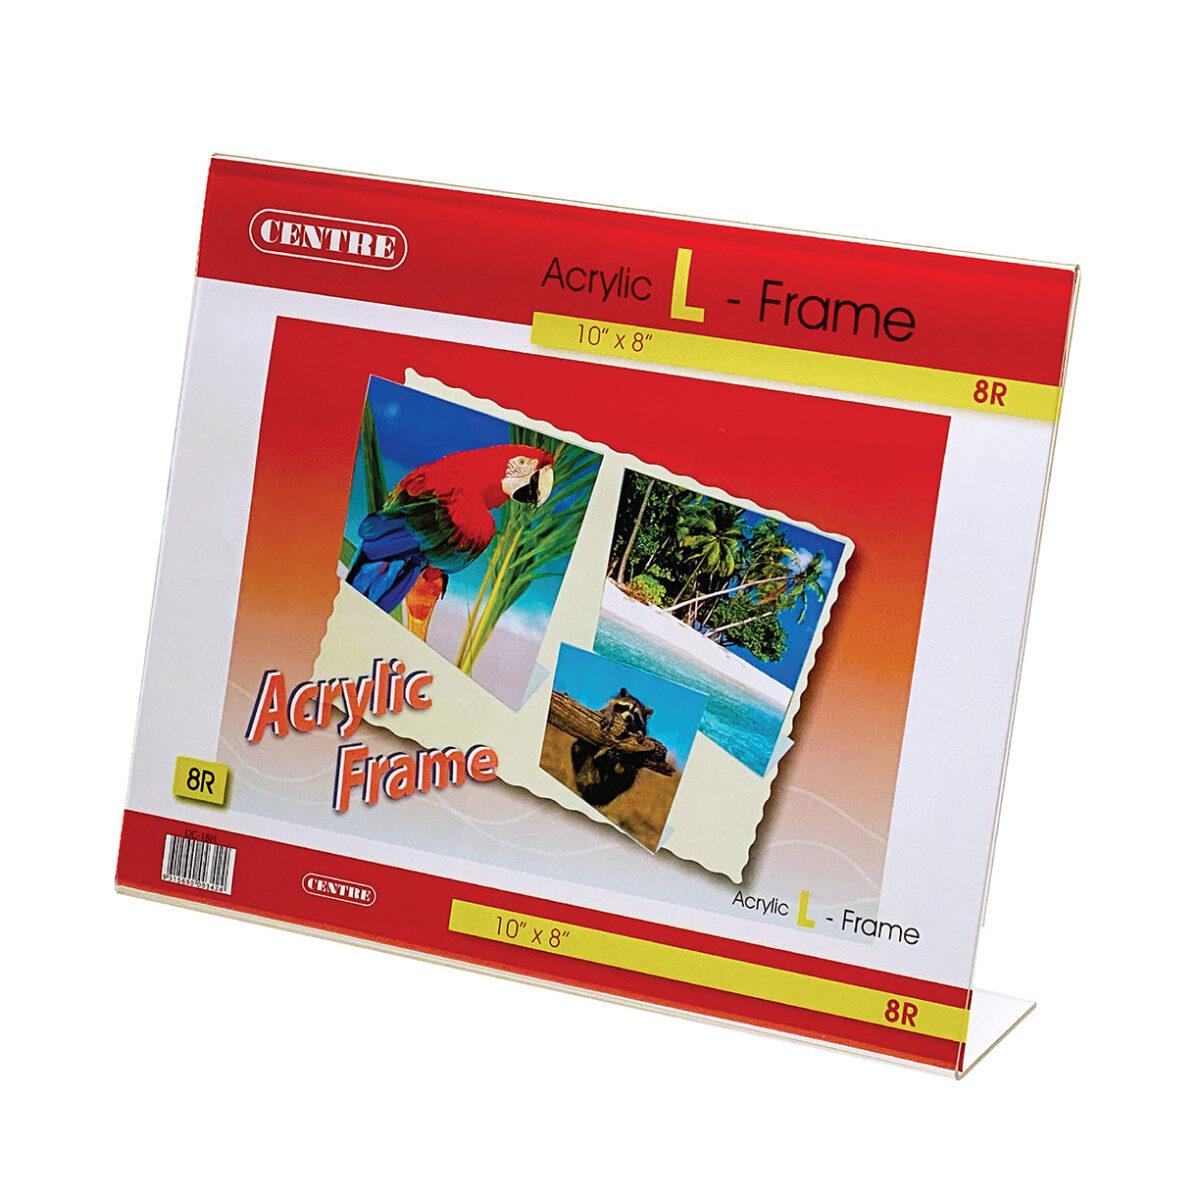 Centre Acrylic Picture Frame - L Stand Landscape 8R